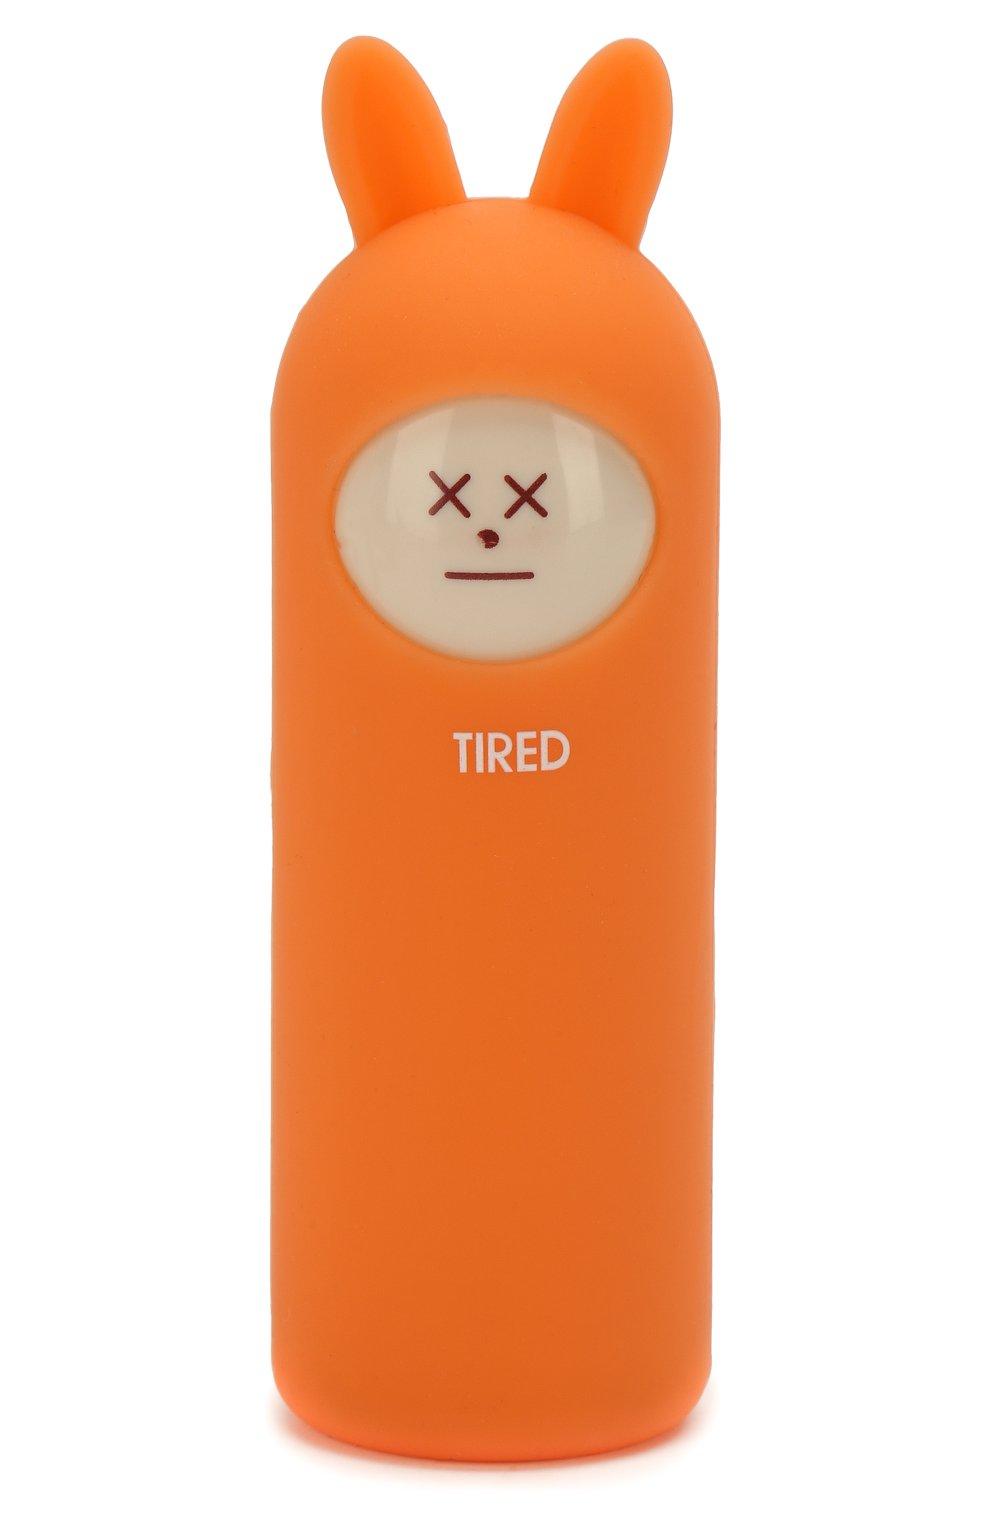 Портативный аккумулятор Neo Rabbit Tired | Фото №1